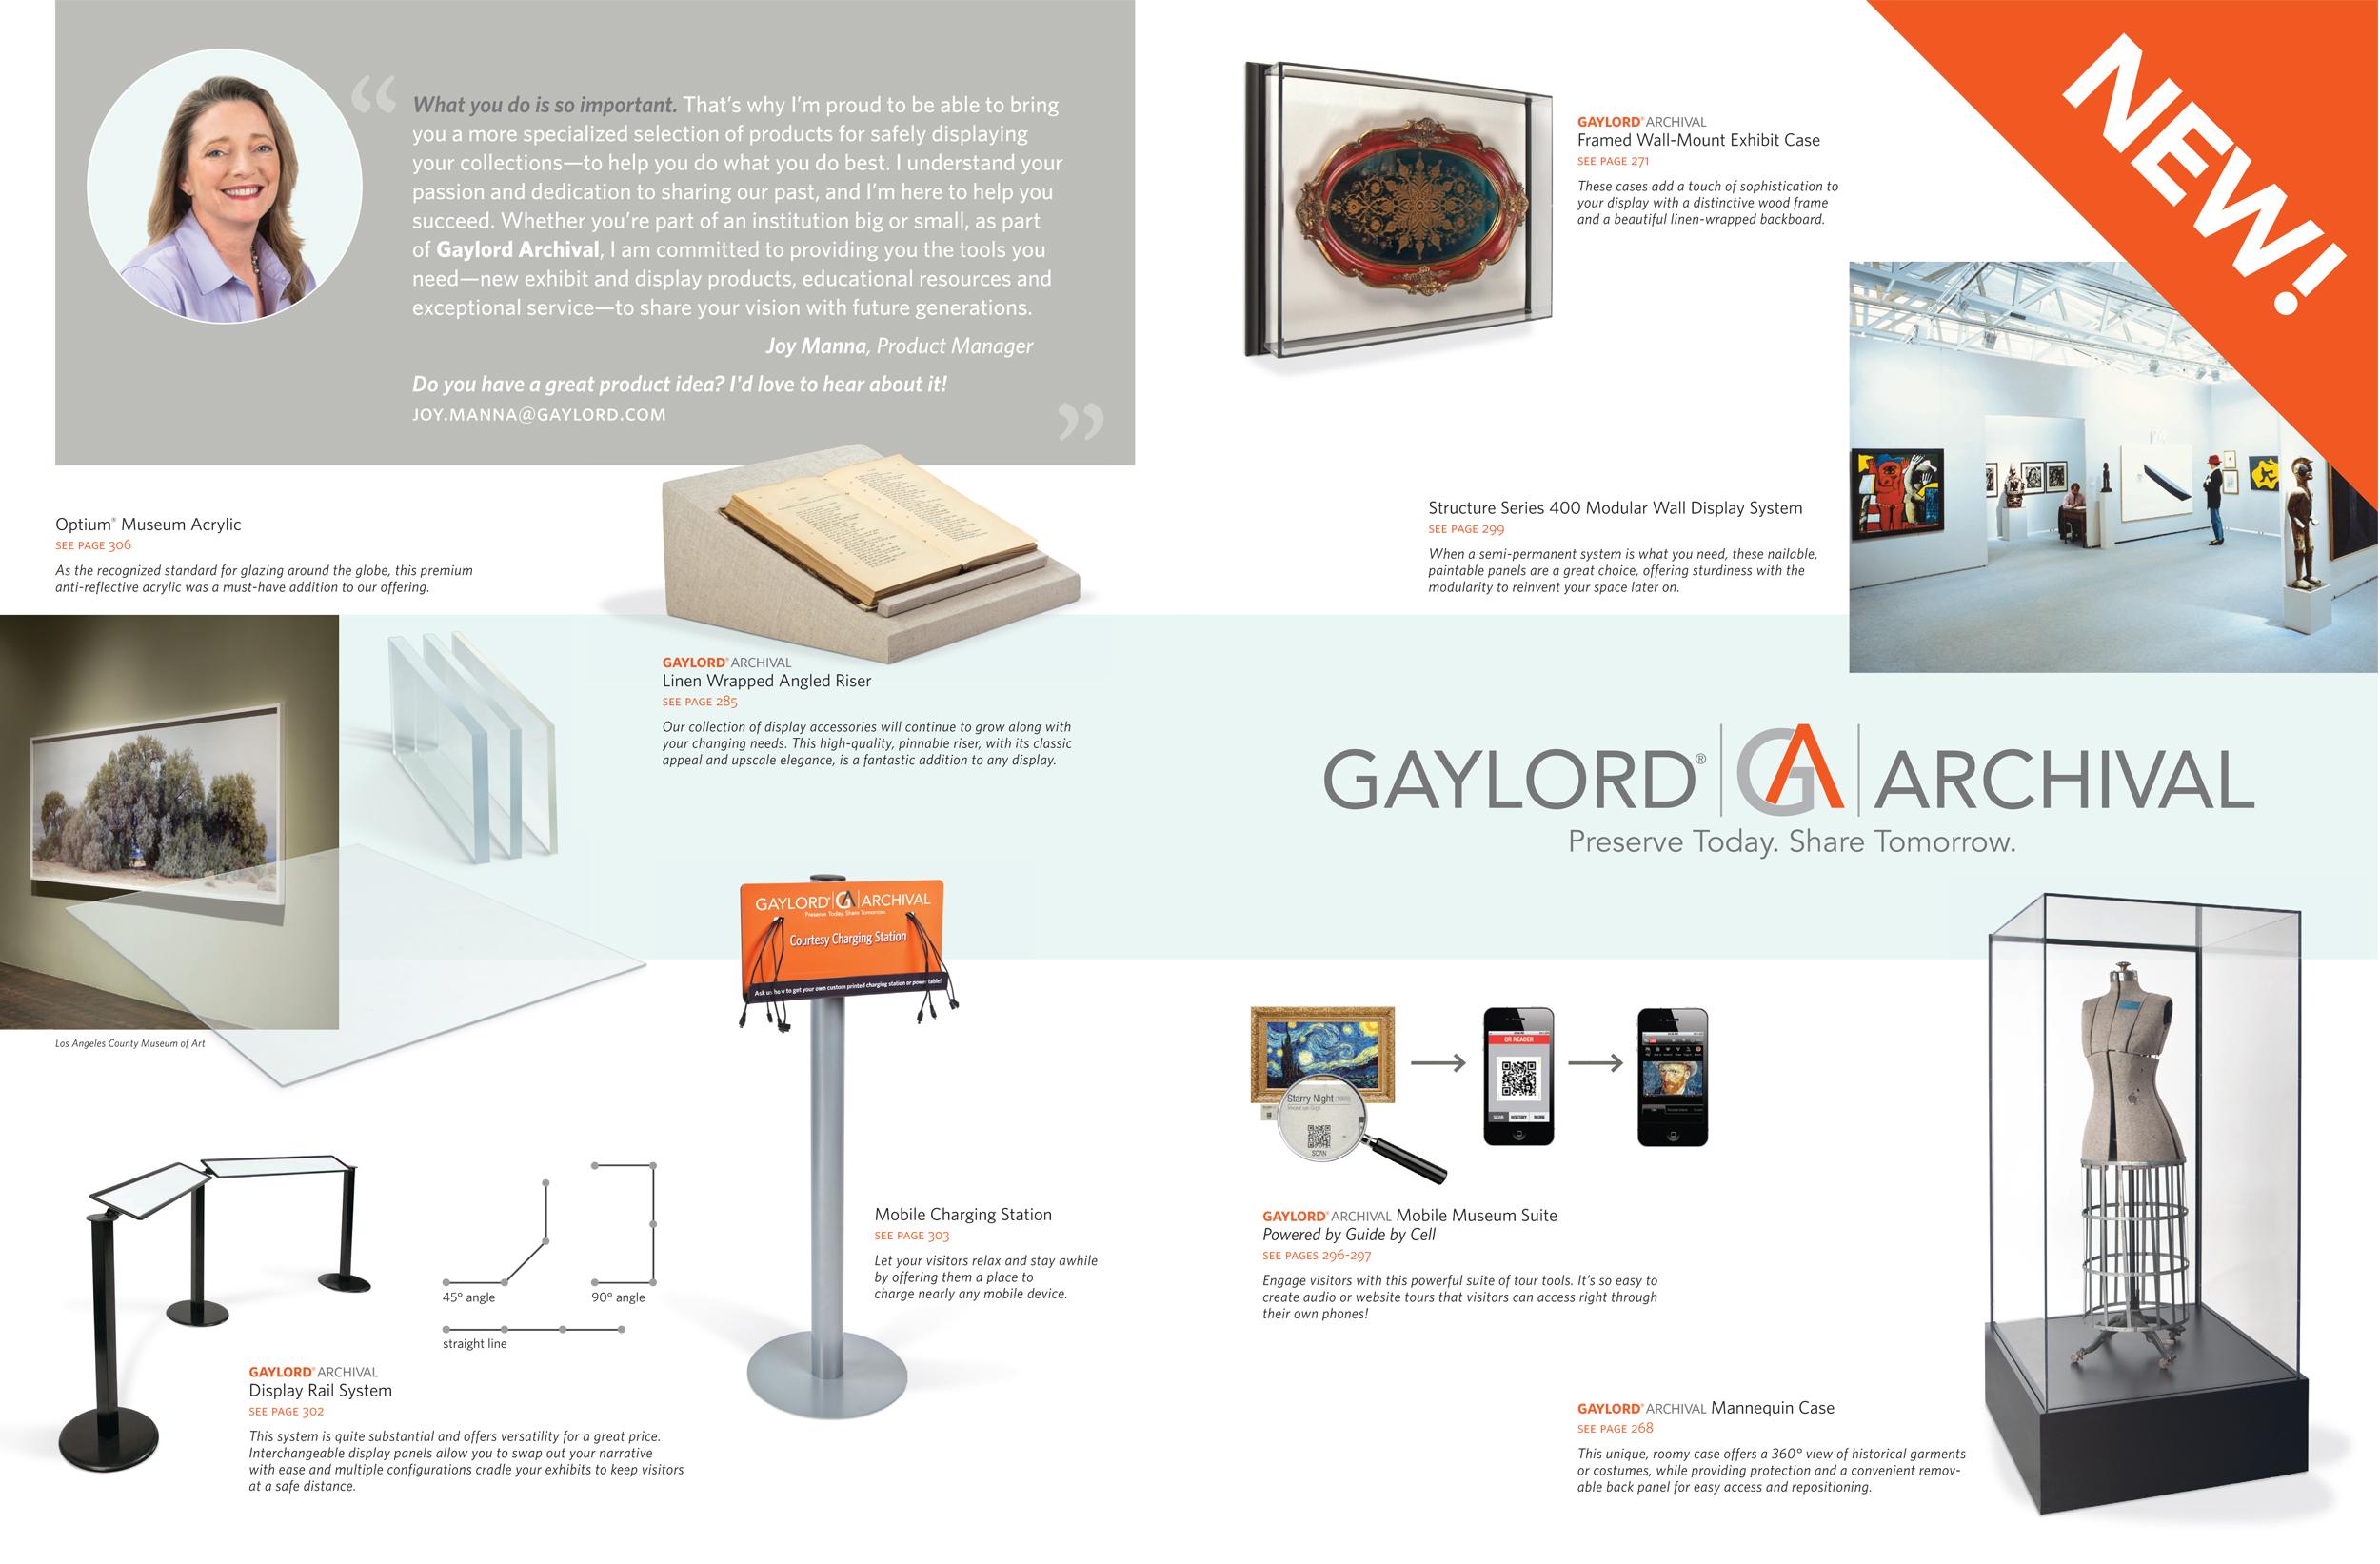 Exhibit & Display, new product spread